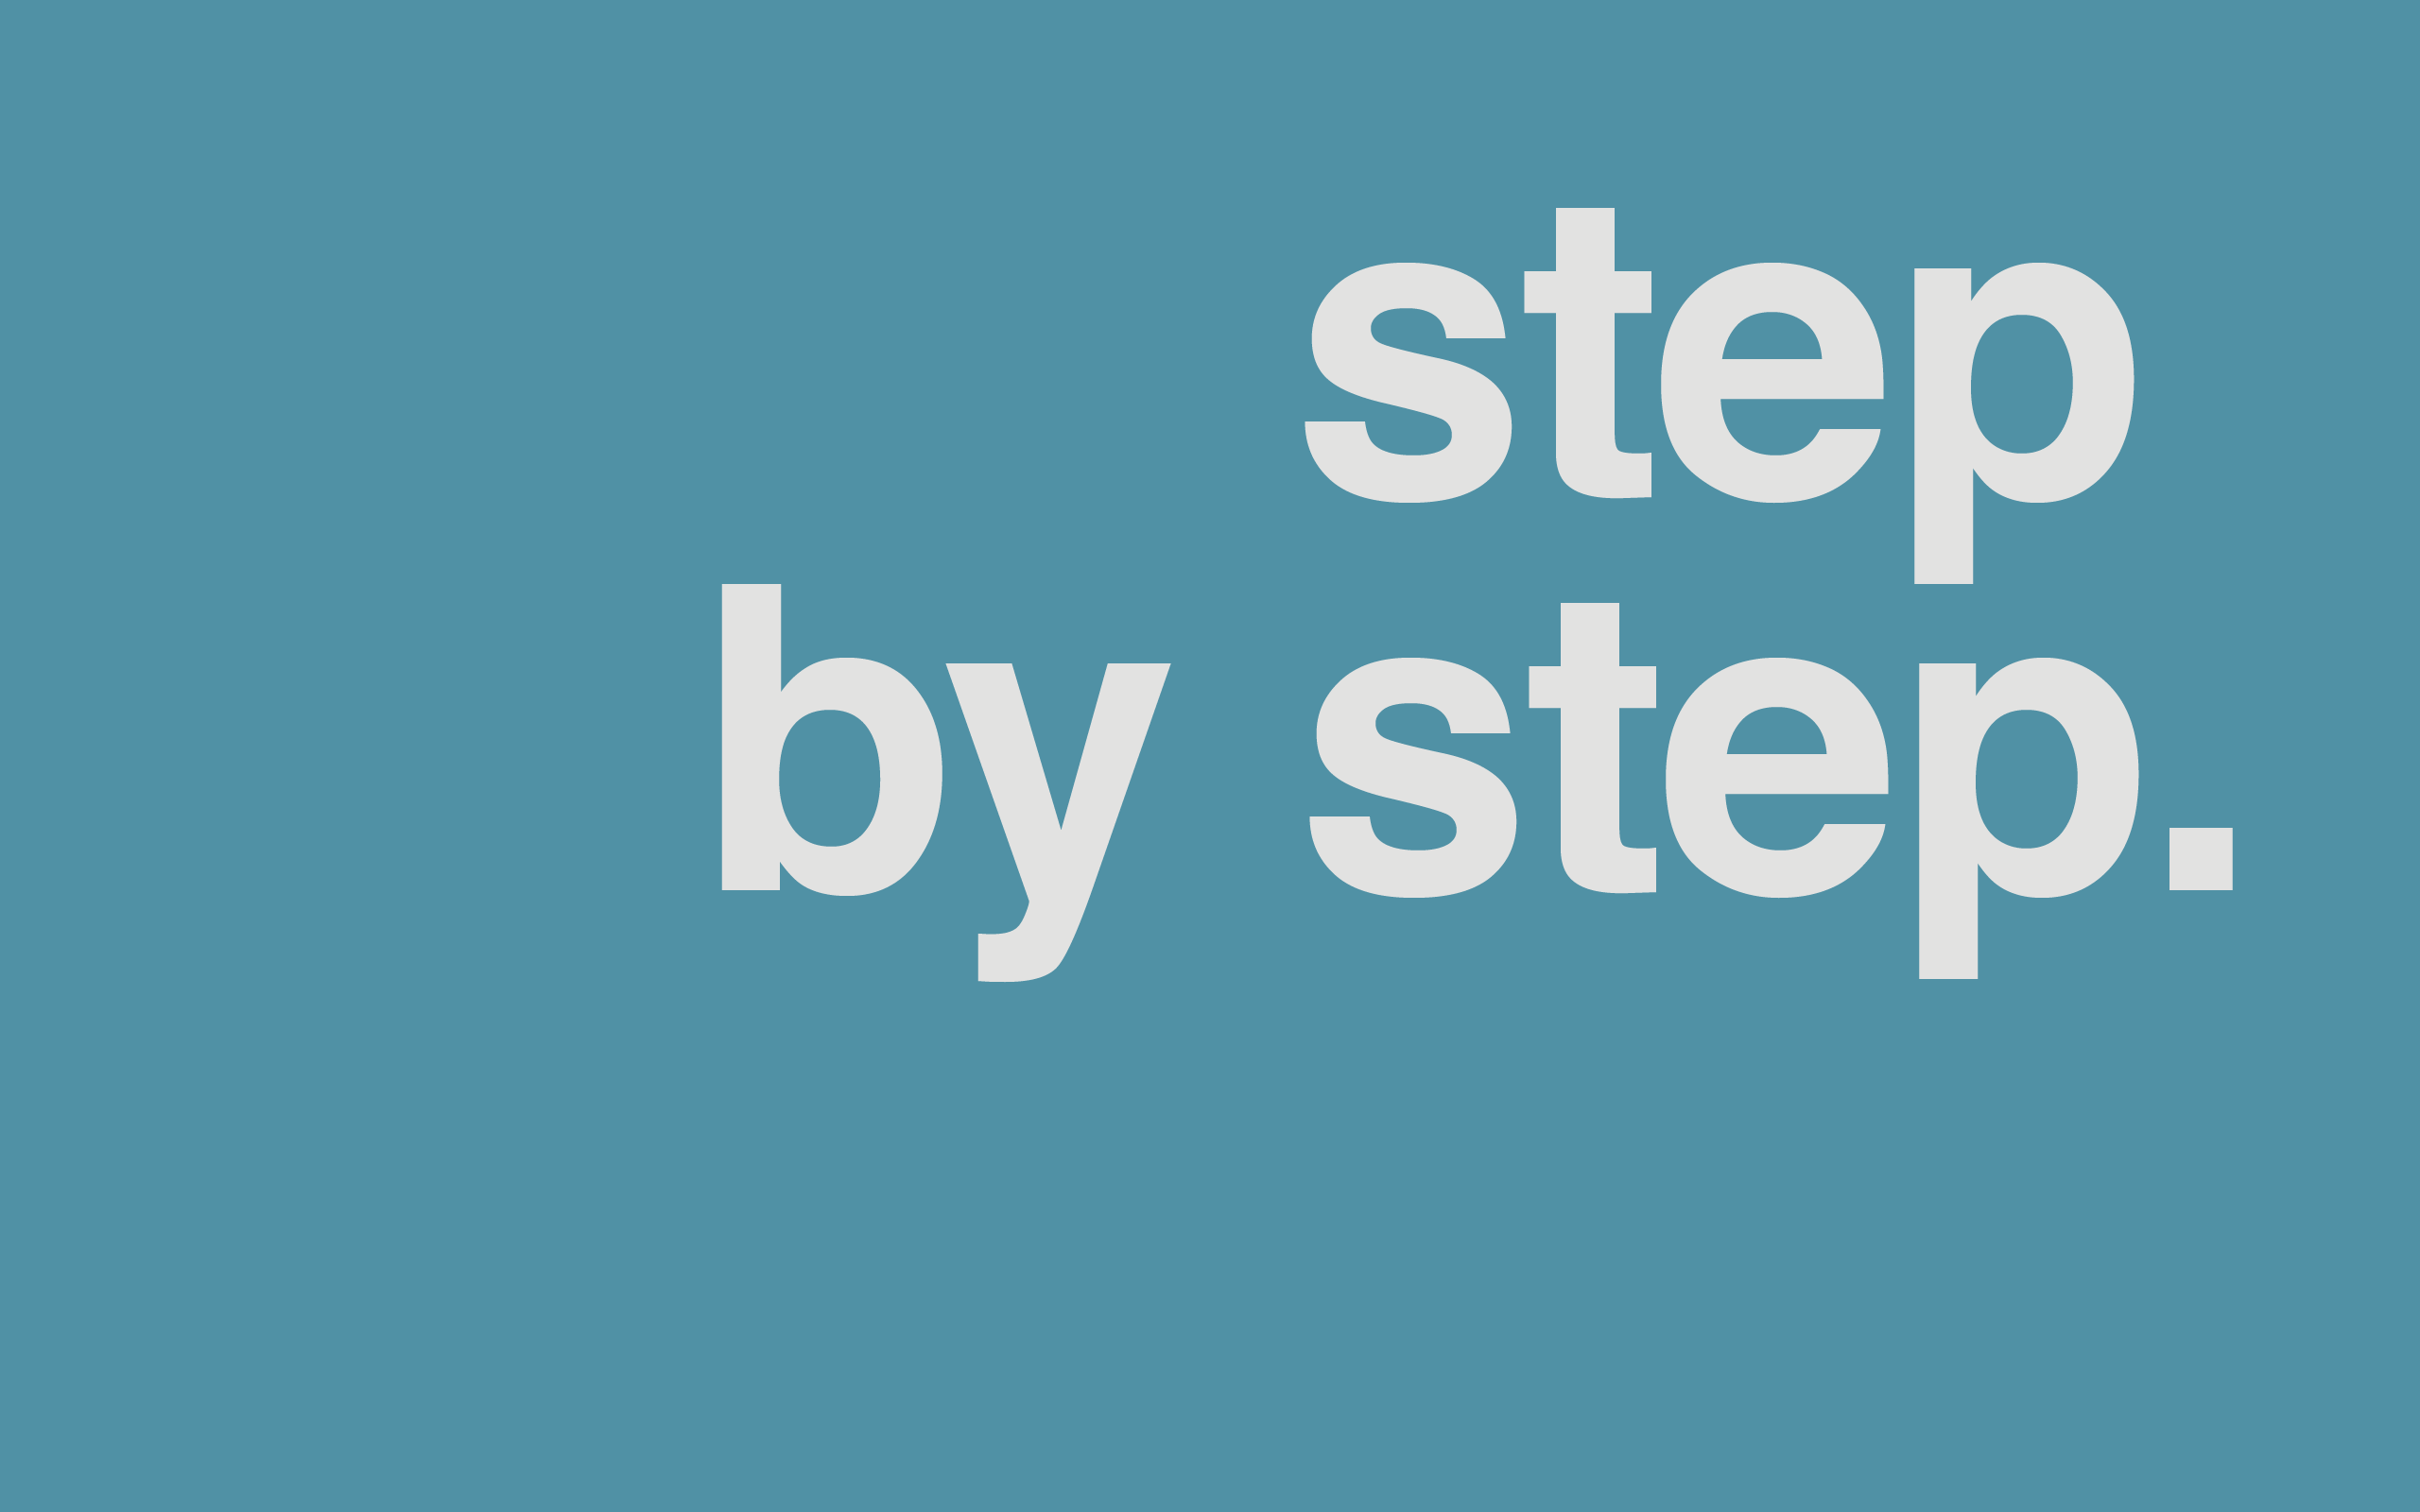 Шаг за шагом — понемногу к большим целям